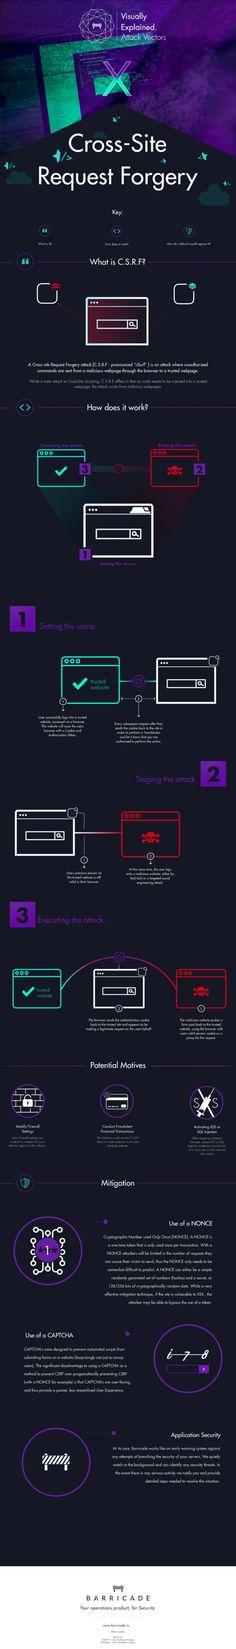 How CSRF attacks work